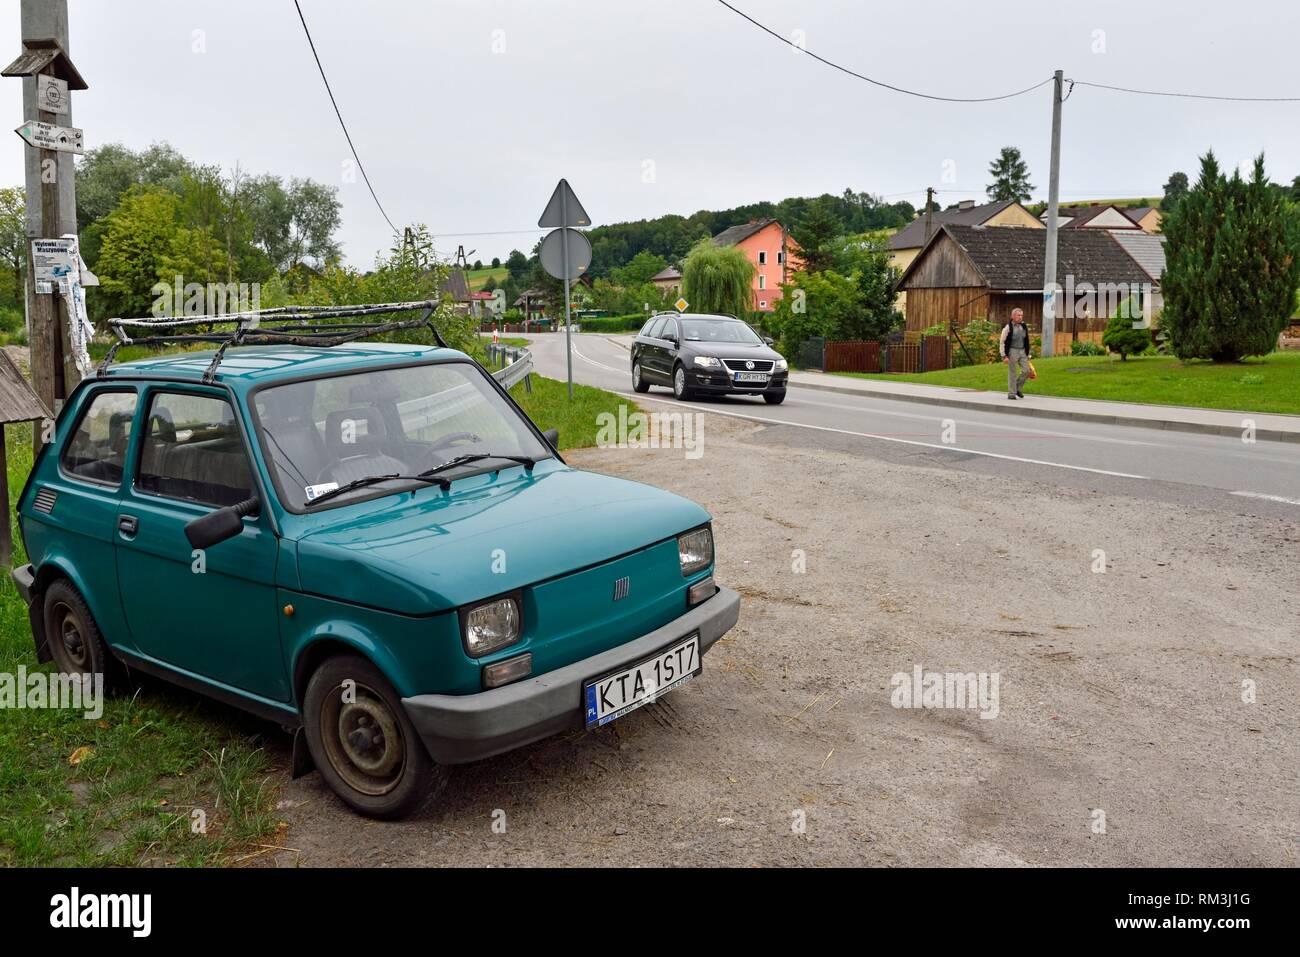 Fiat FSM 126, village of Binarowa, County of Gorlice, Malopolska Province (Lesser Poland), Poland, Central Europe. - Stock Image